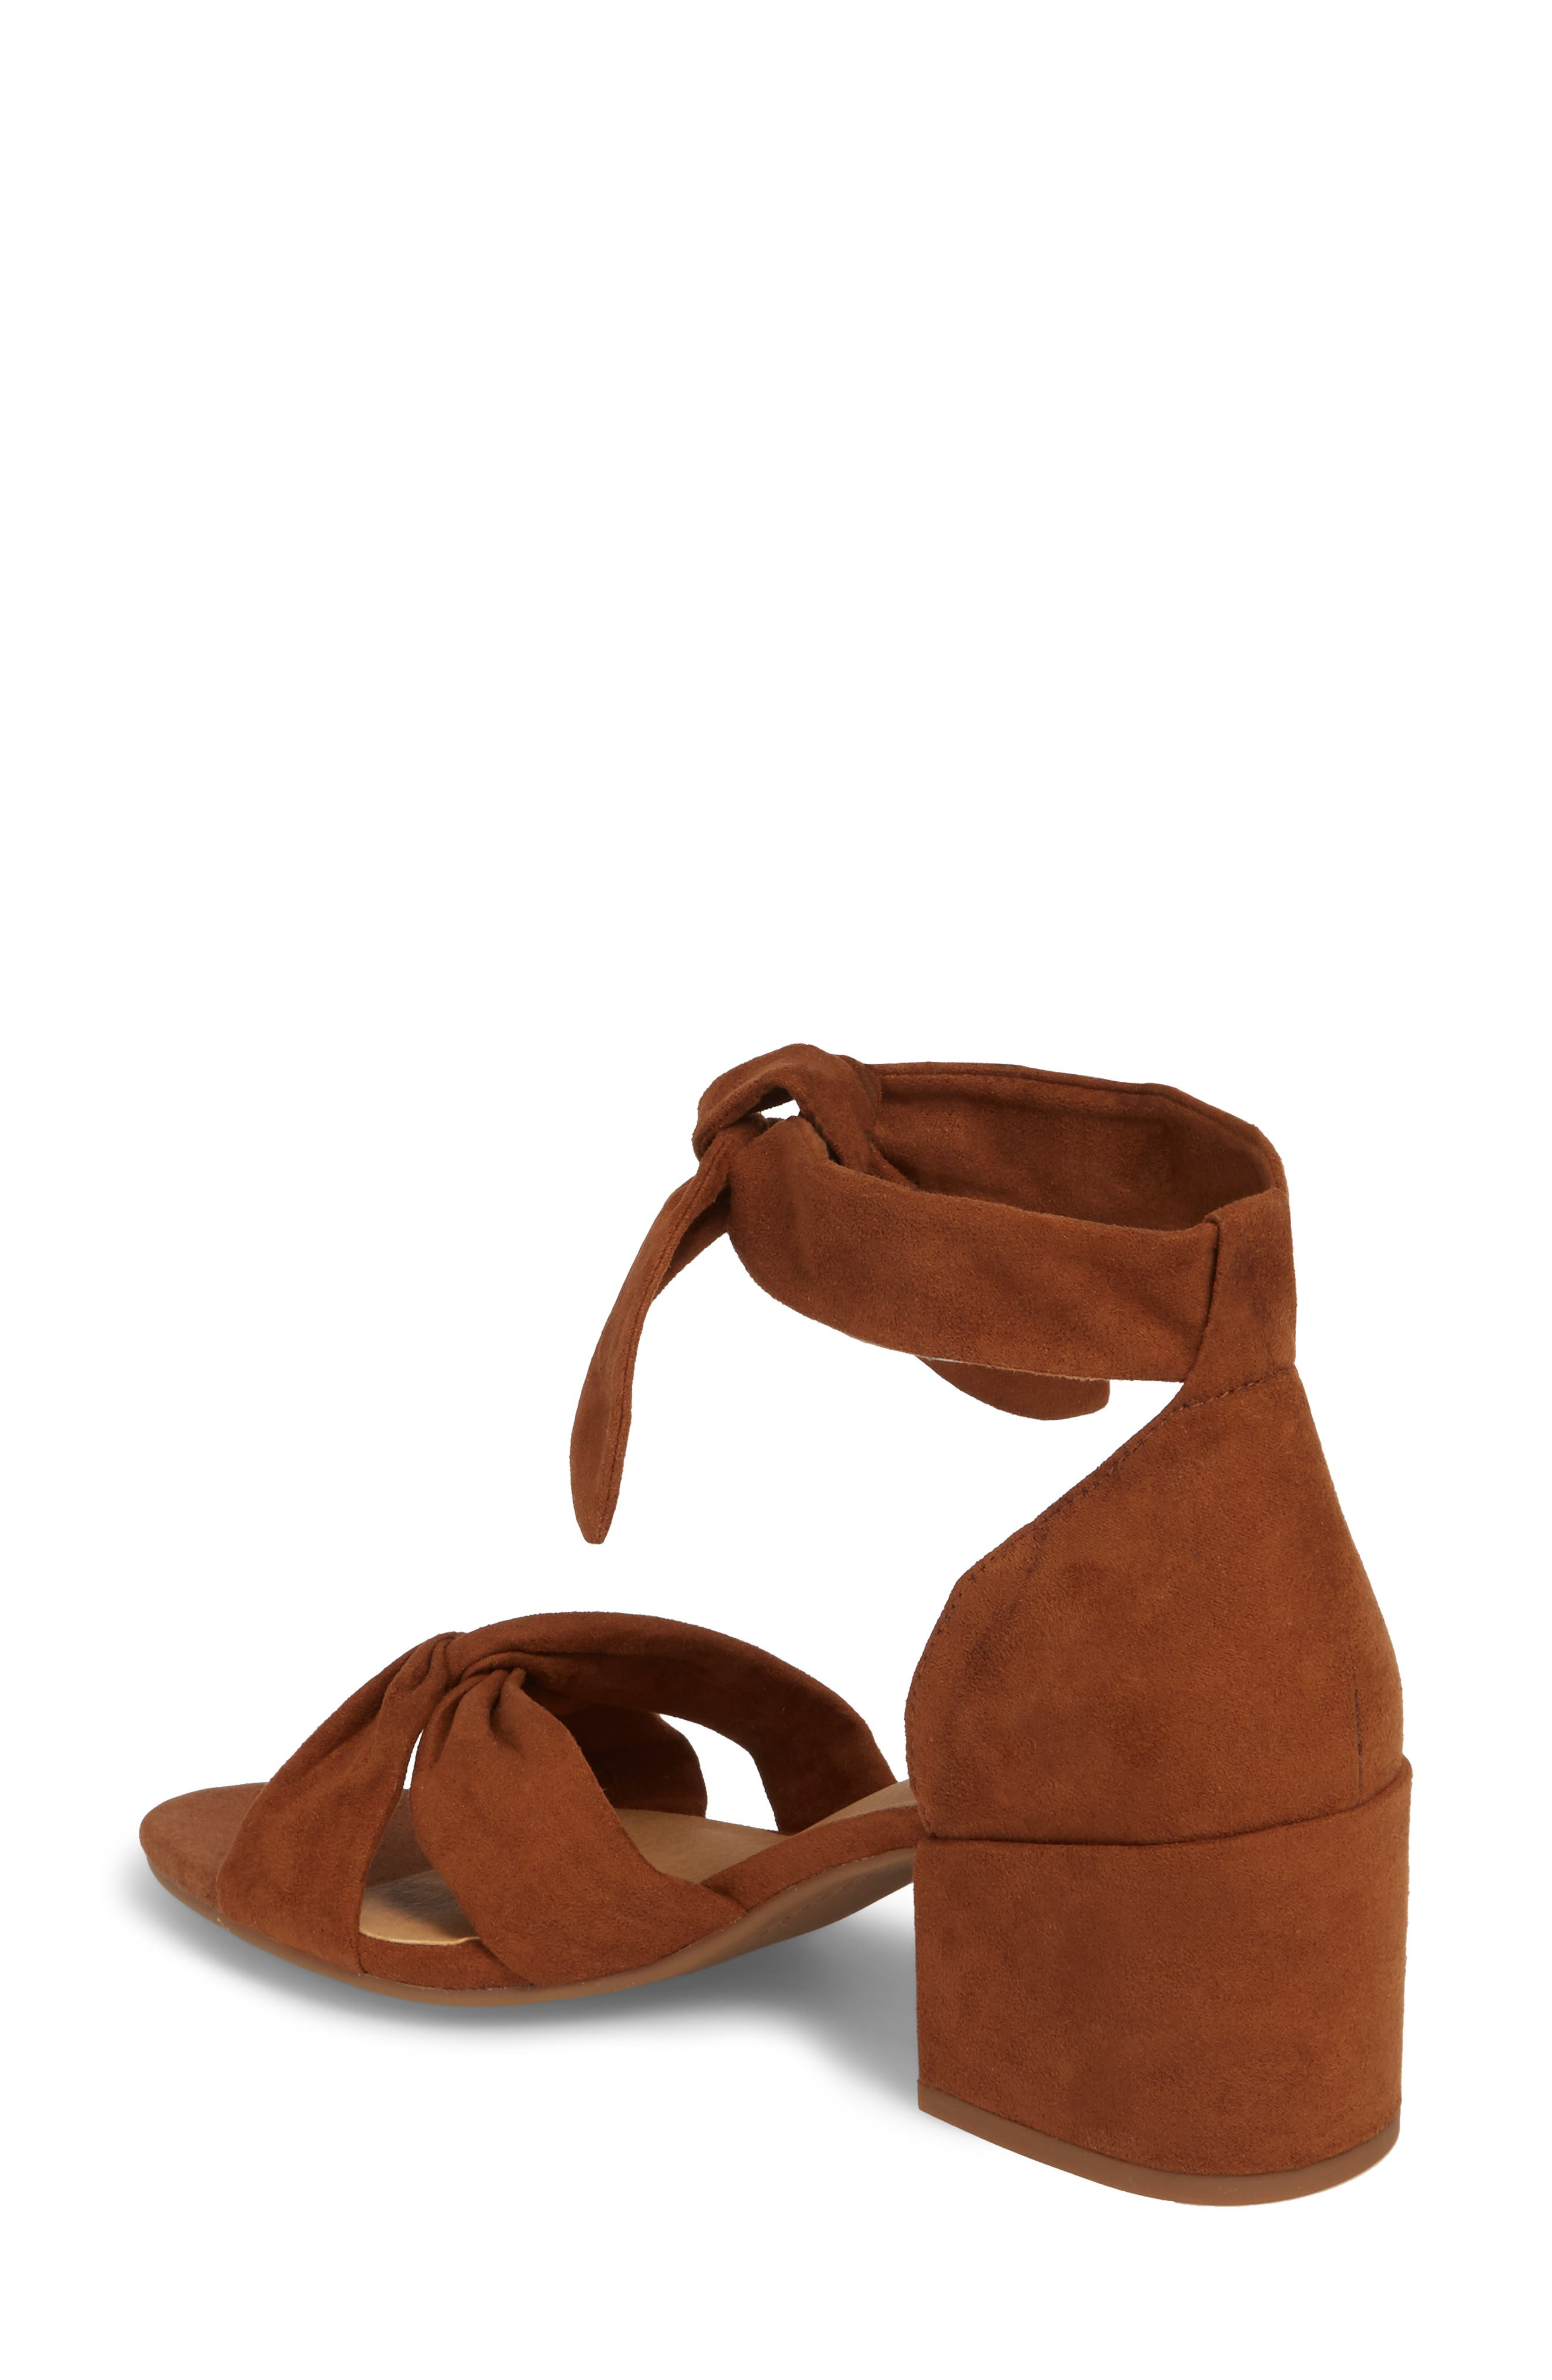 Xaylah Ankle Strap Sandal,                             Alternate thumbnail 10, color,